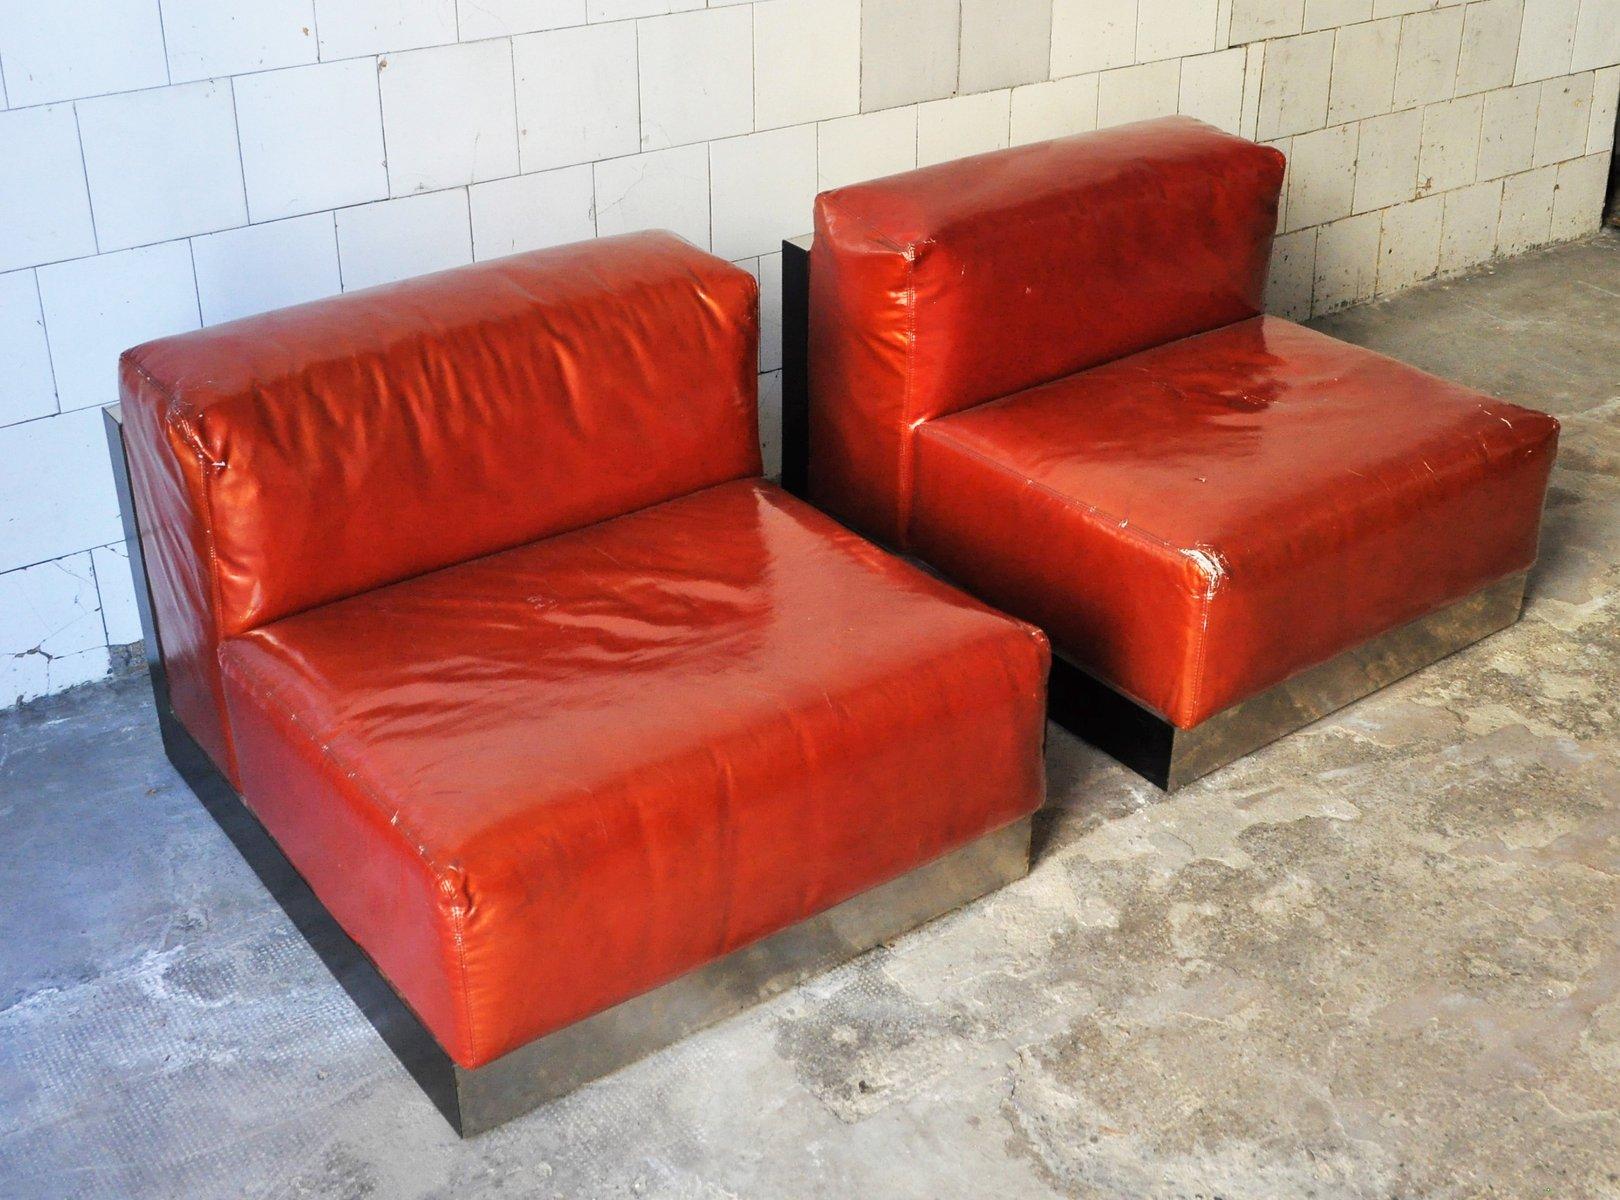 lackierte italienische vintage sessel von cinova 1970er. Black Bedroom Furniture Sets. Home Design Ideas